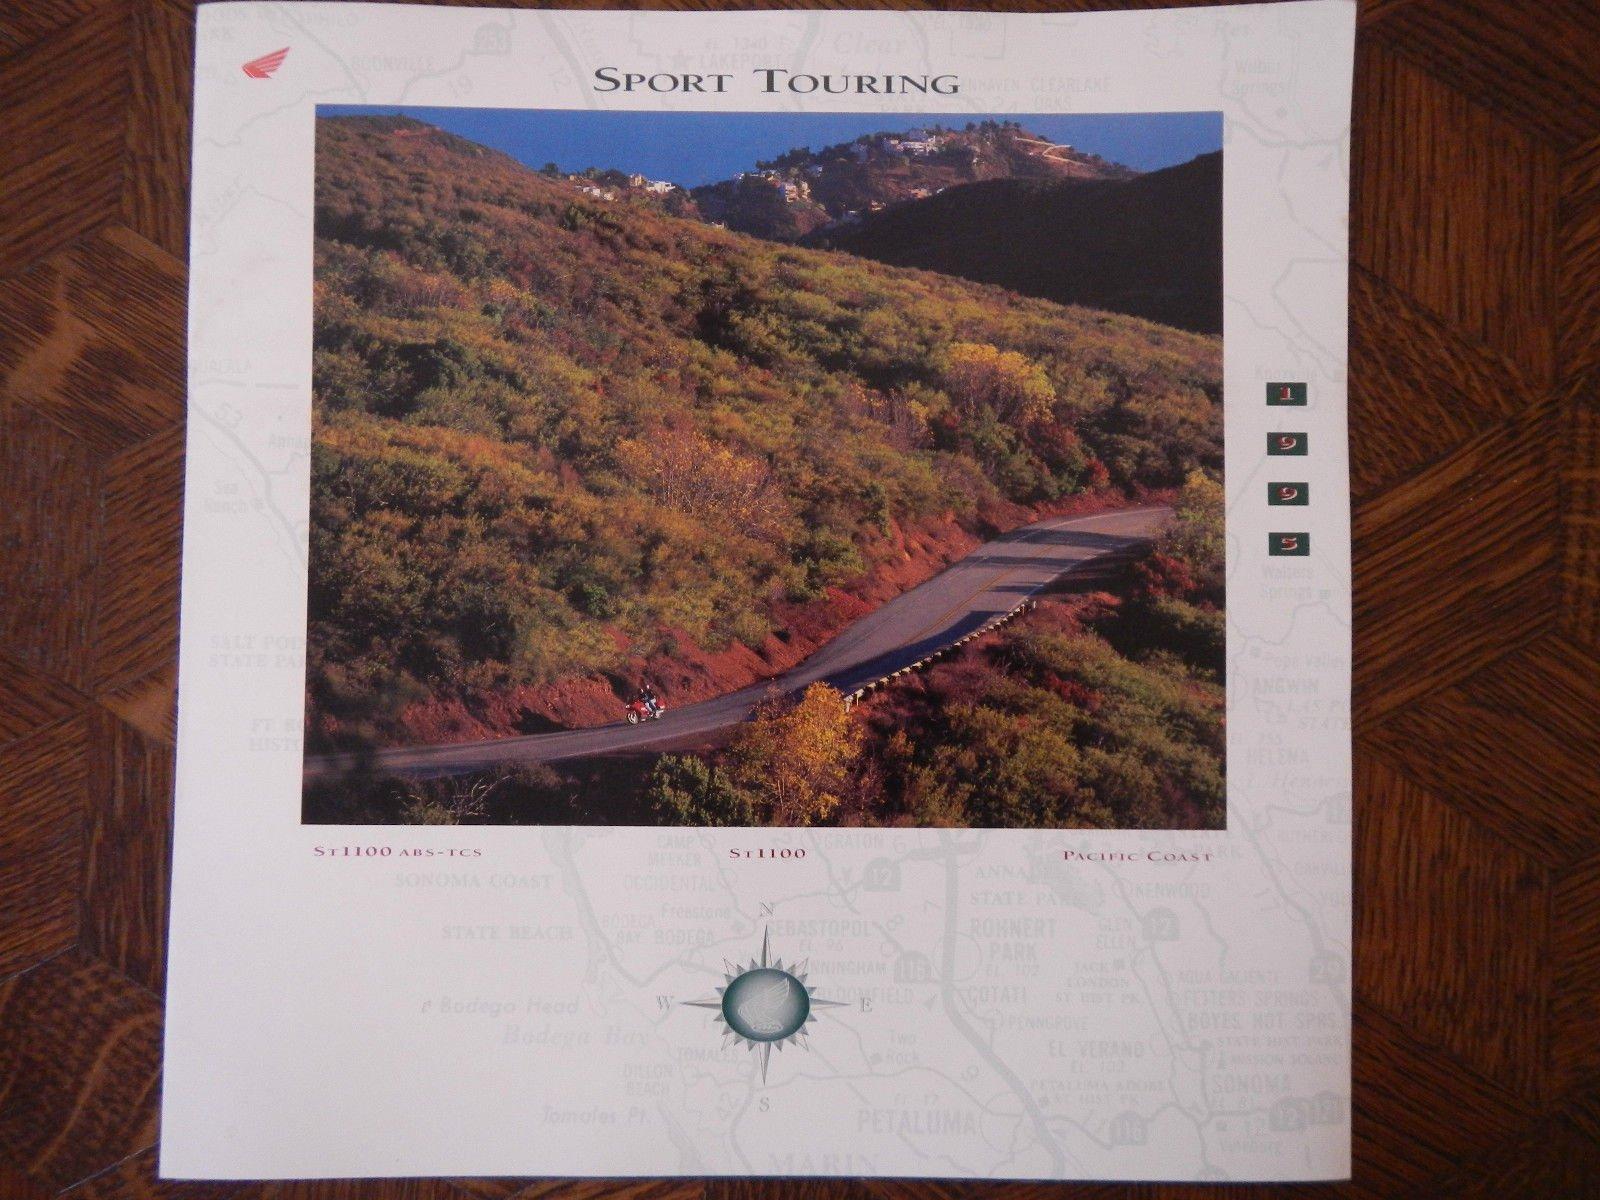 HONDA SPORT TOURING SERIES NOS OEM DEALER'S SALES SHEET LITERATURE BROCHURE 3